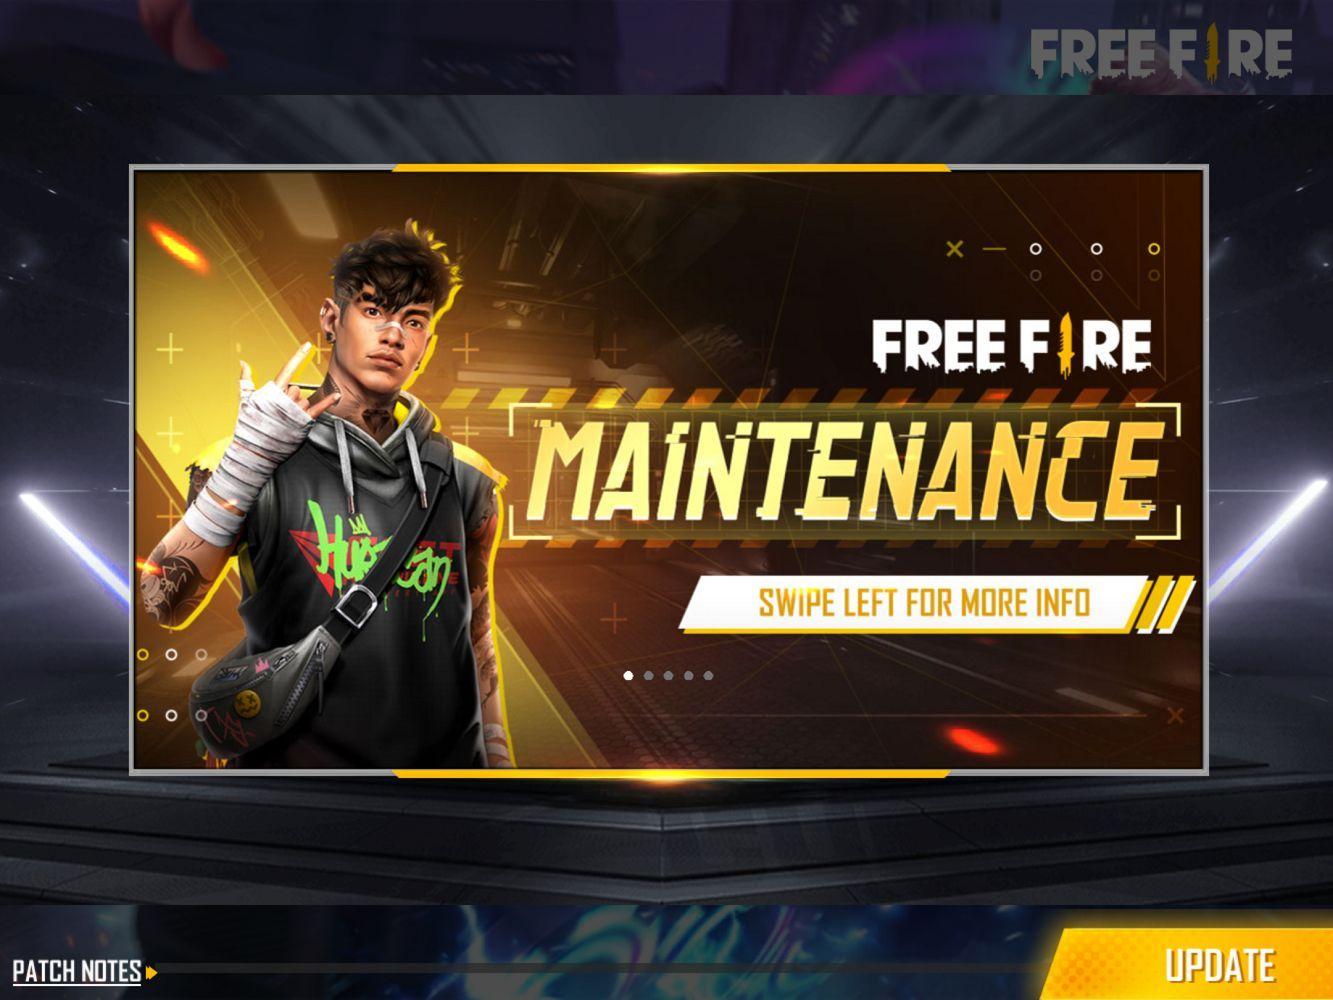 Maintnance Free Fire berlangsung dari pukul 11.00 WIB